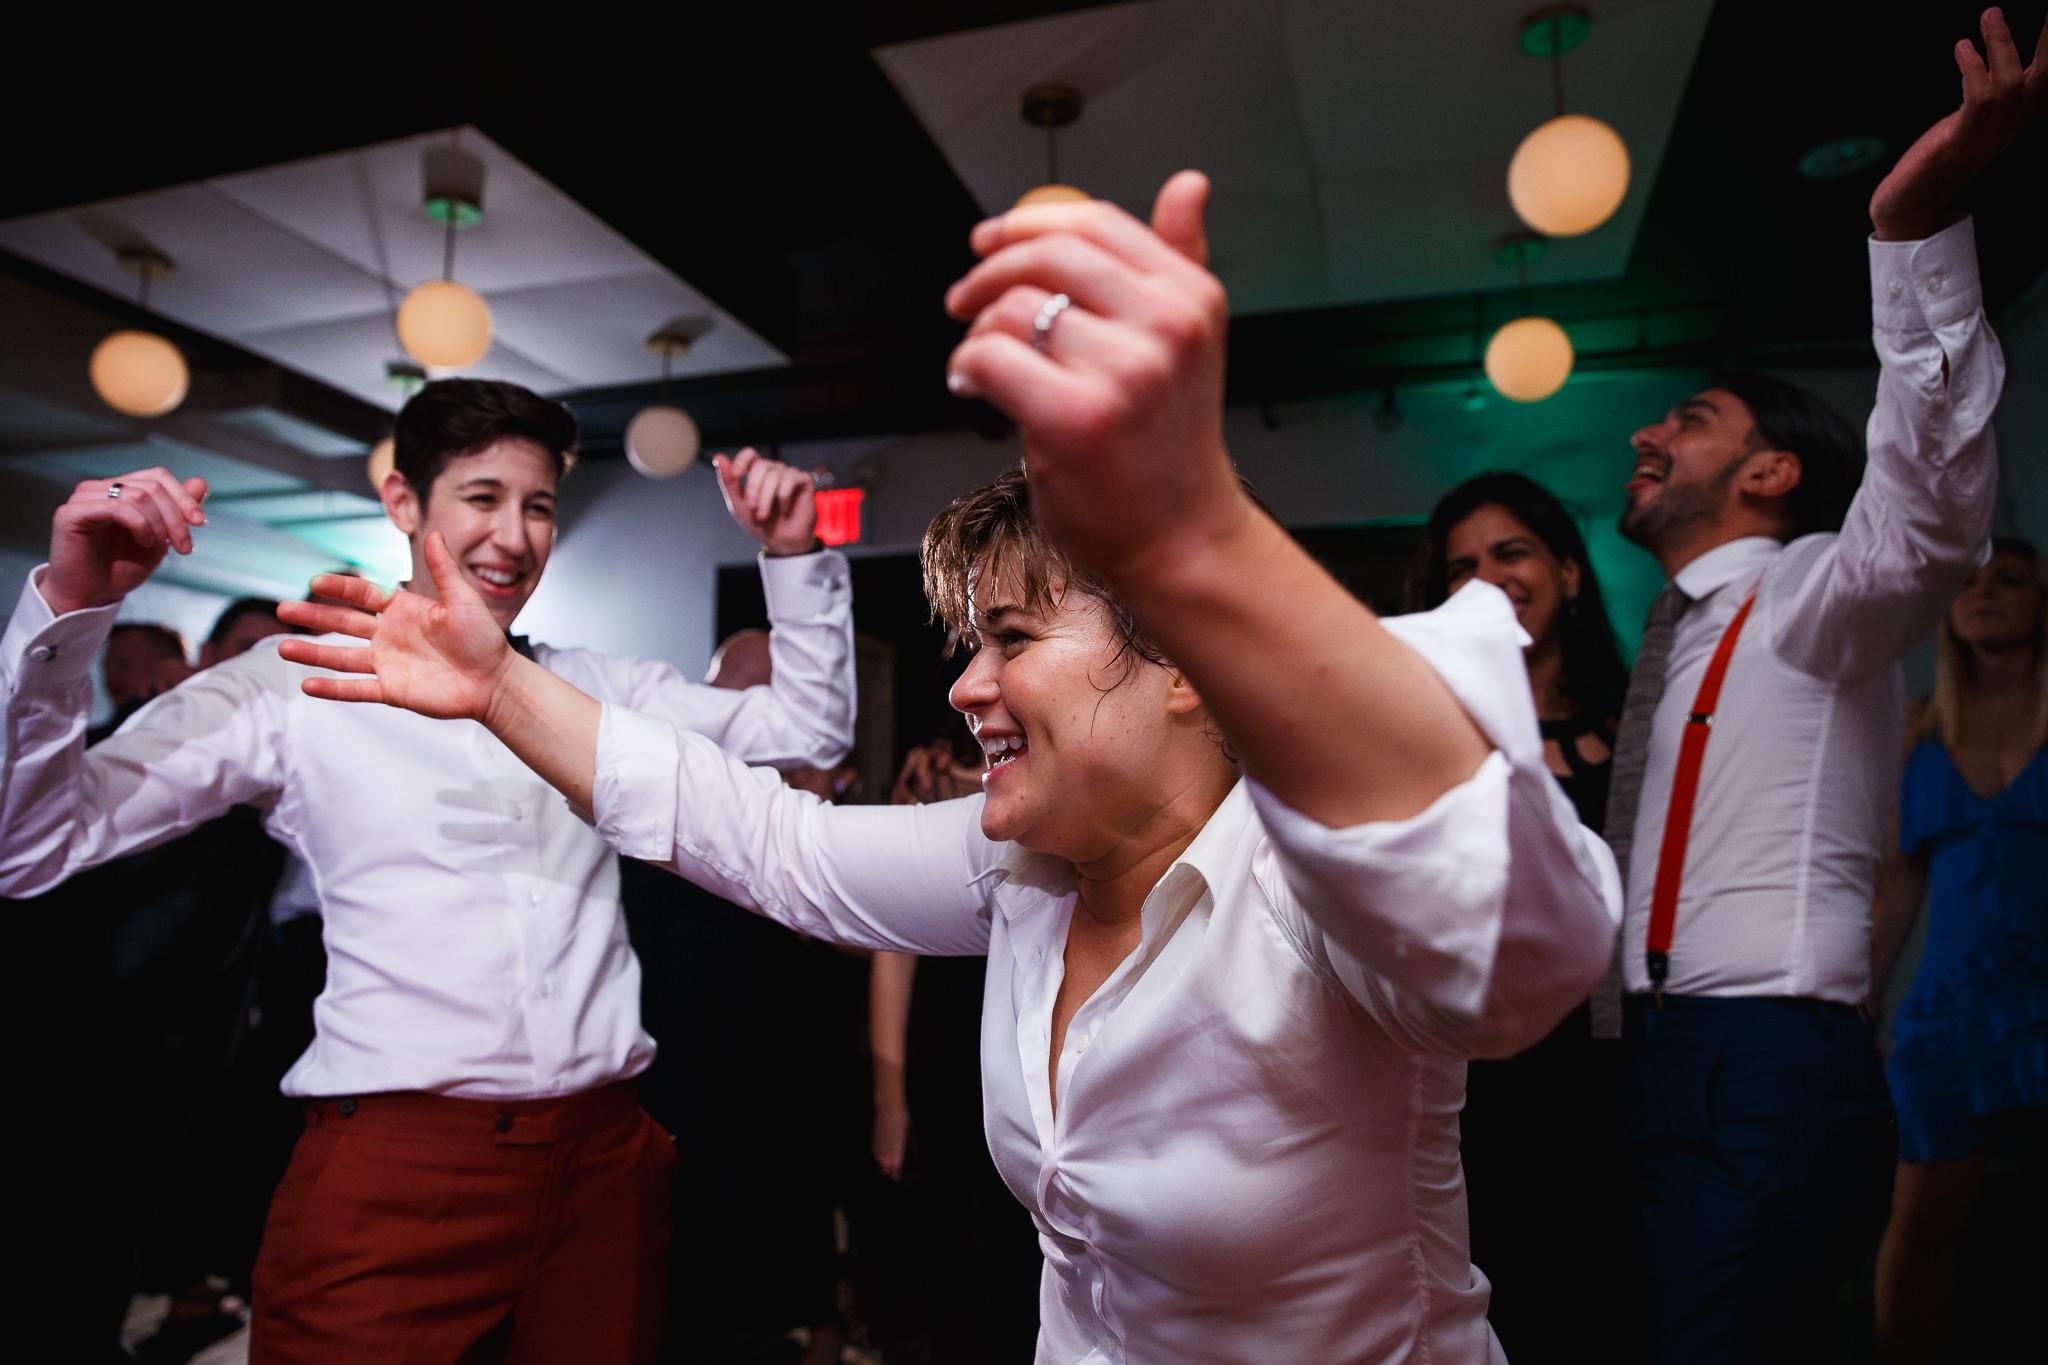 Havens Kitchen wedding, new york city wedding photographer, brooklyn wedding photographer, chelsea wedding, hudson valley wedding photographer, lgbtq wedding, long island wedding photographer